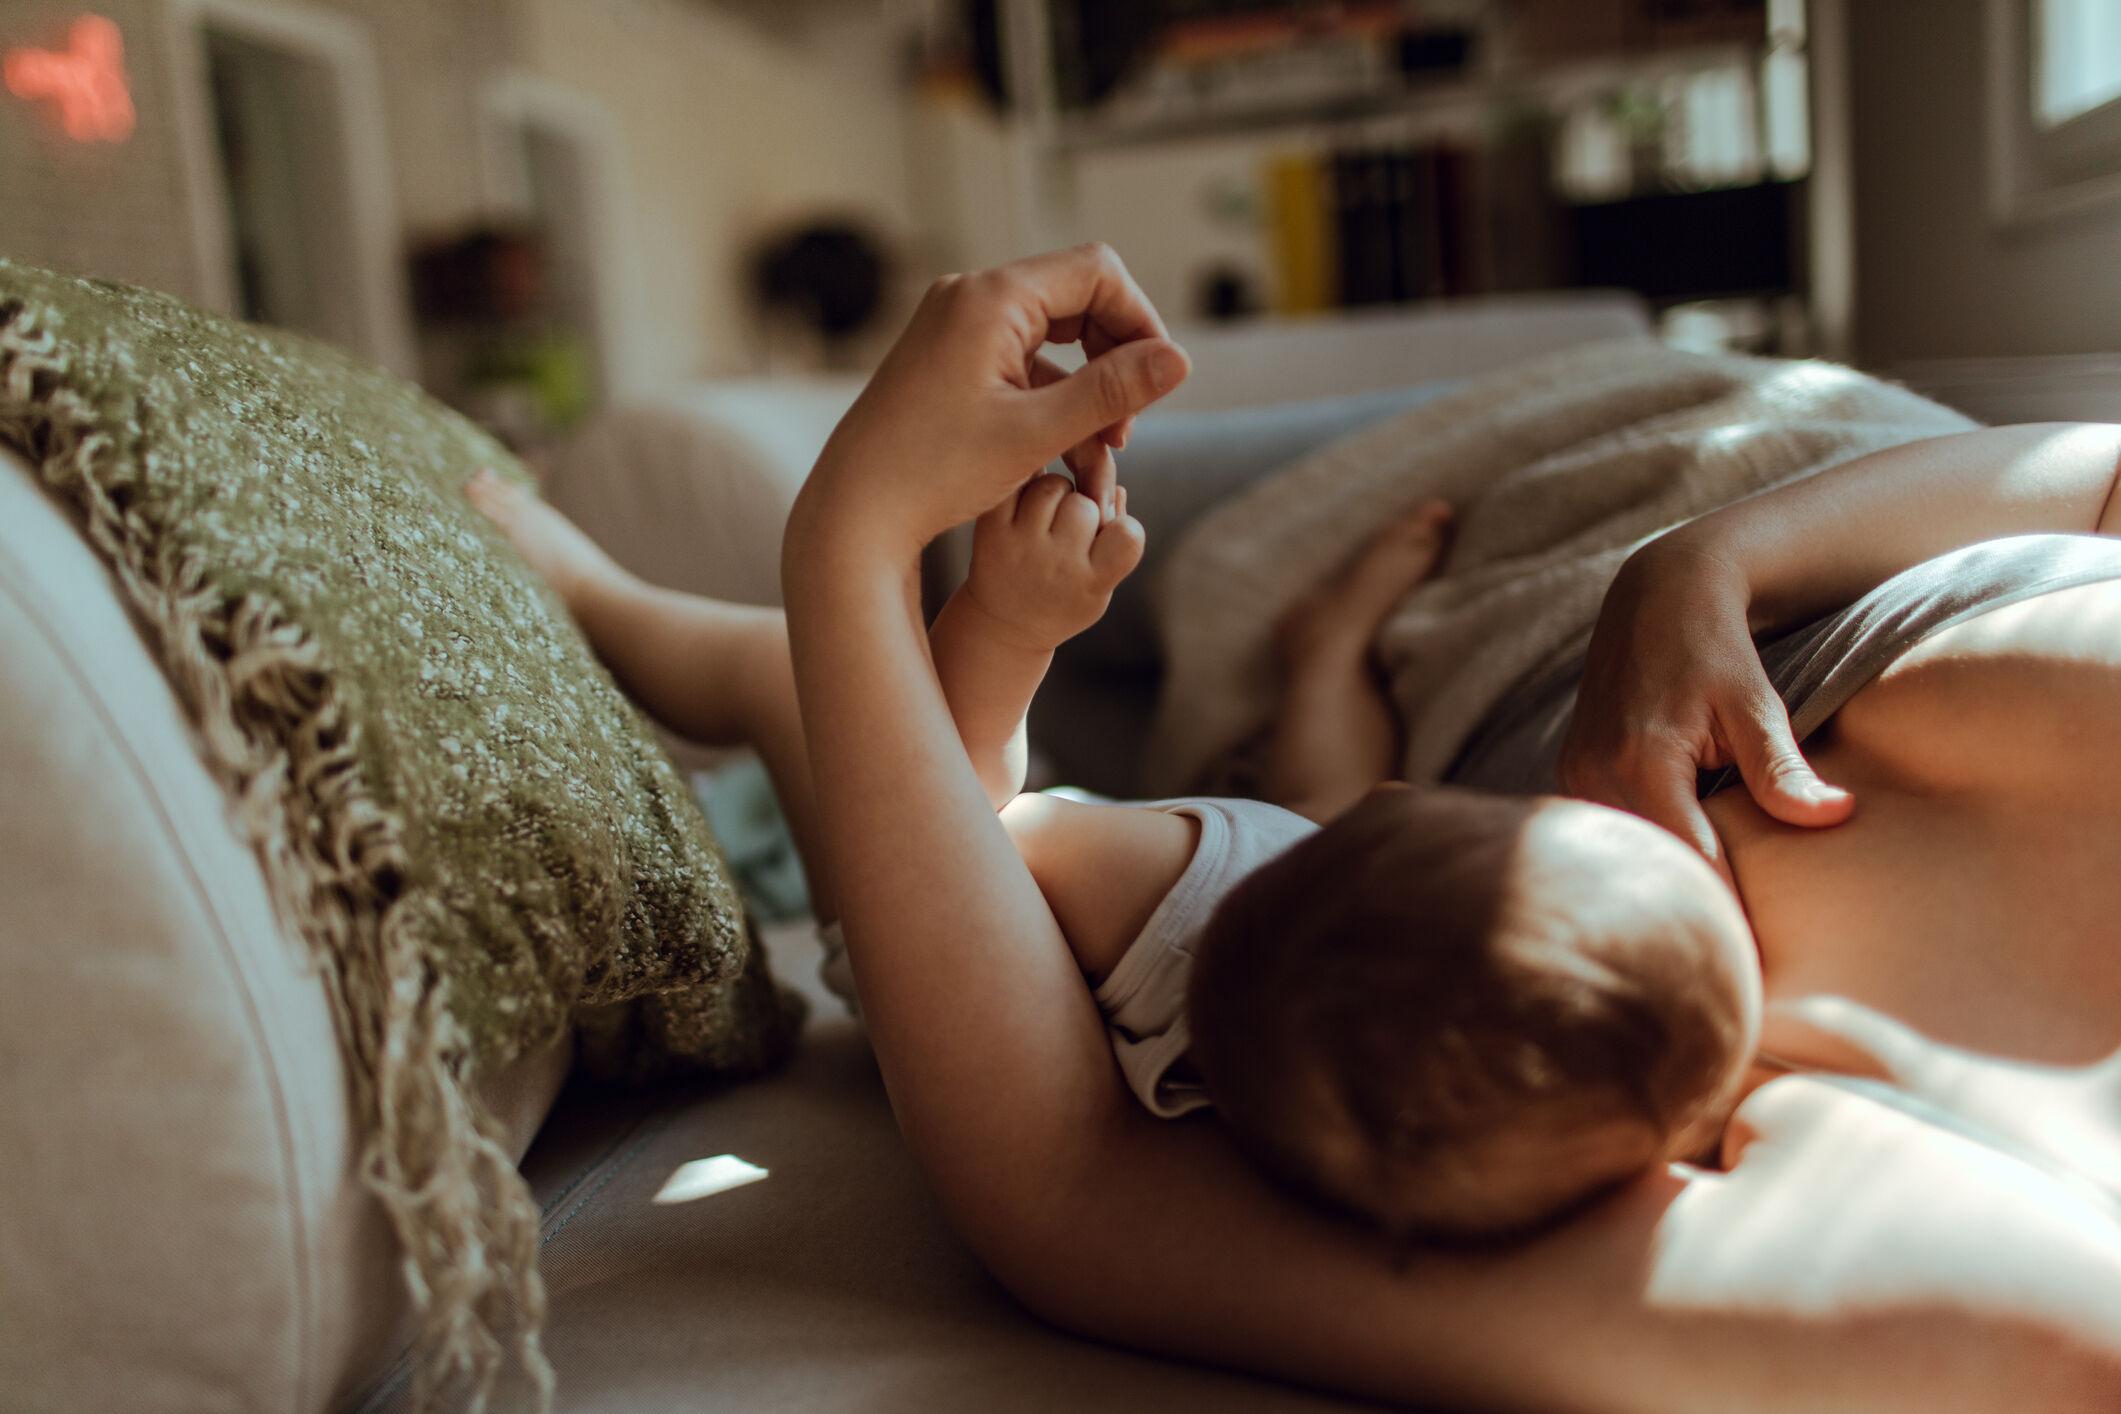 mae-amamentando-bebe-na-cama